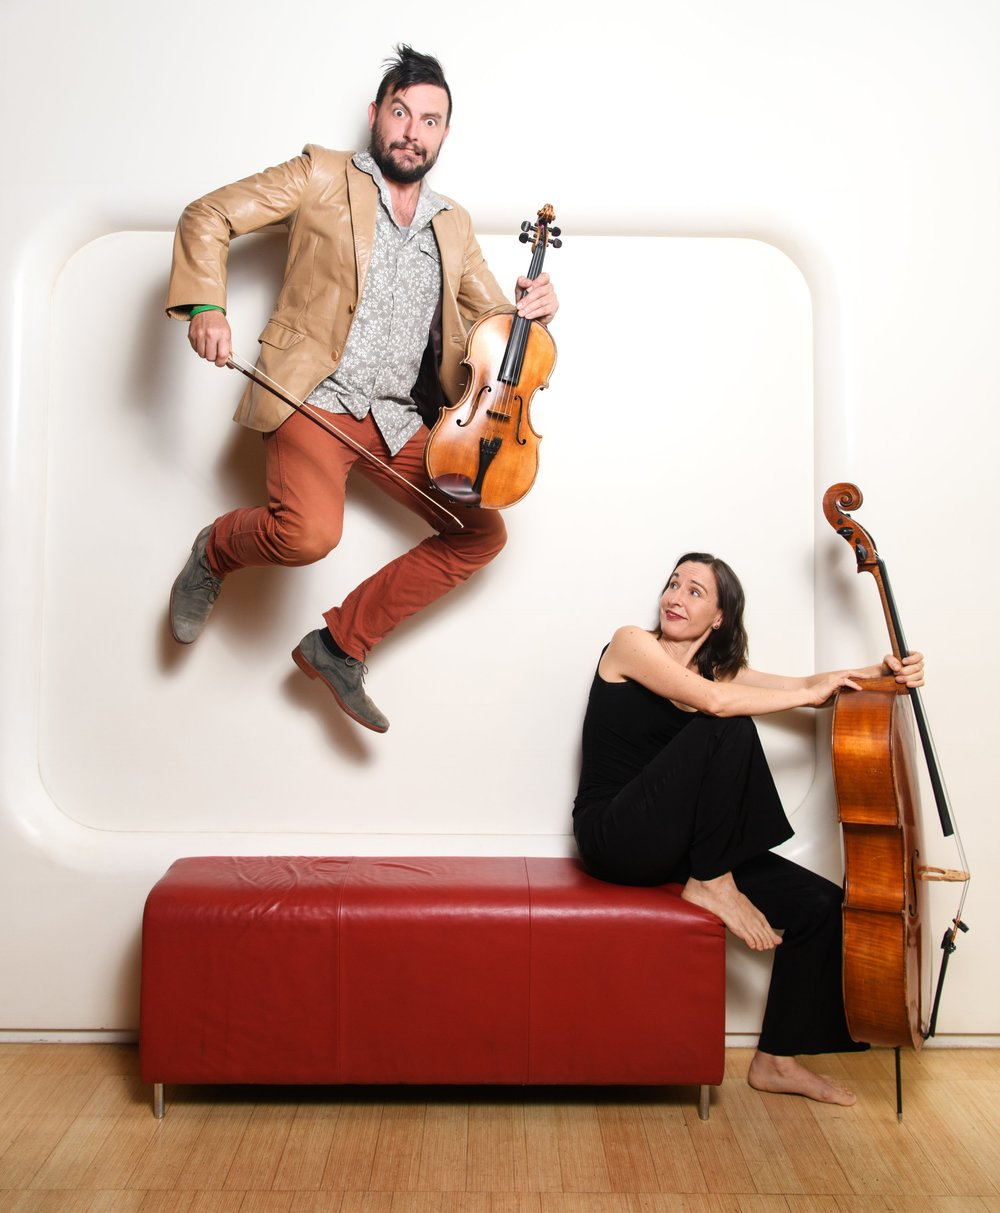 Hawthorn Arts Centre - Thursday 26 July, 7:30pm